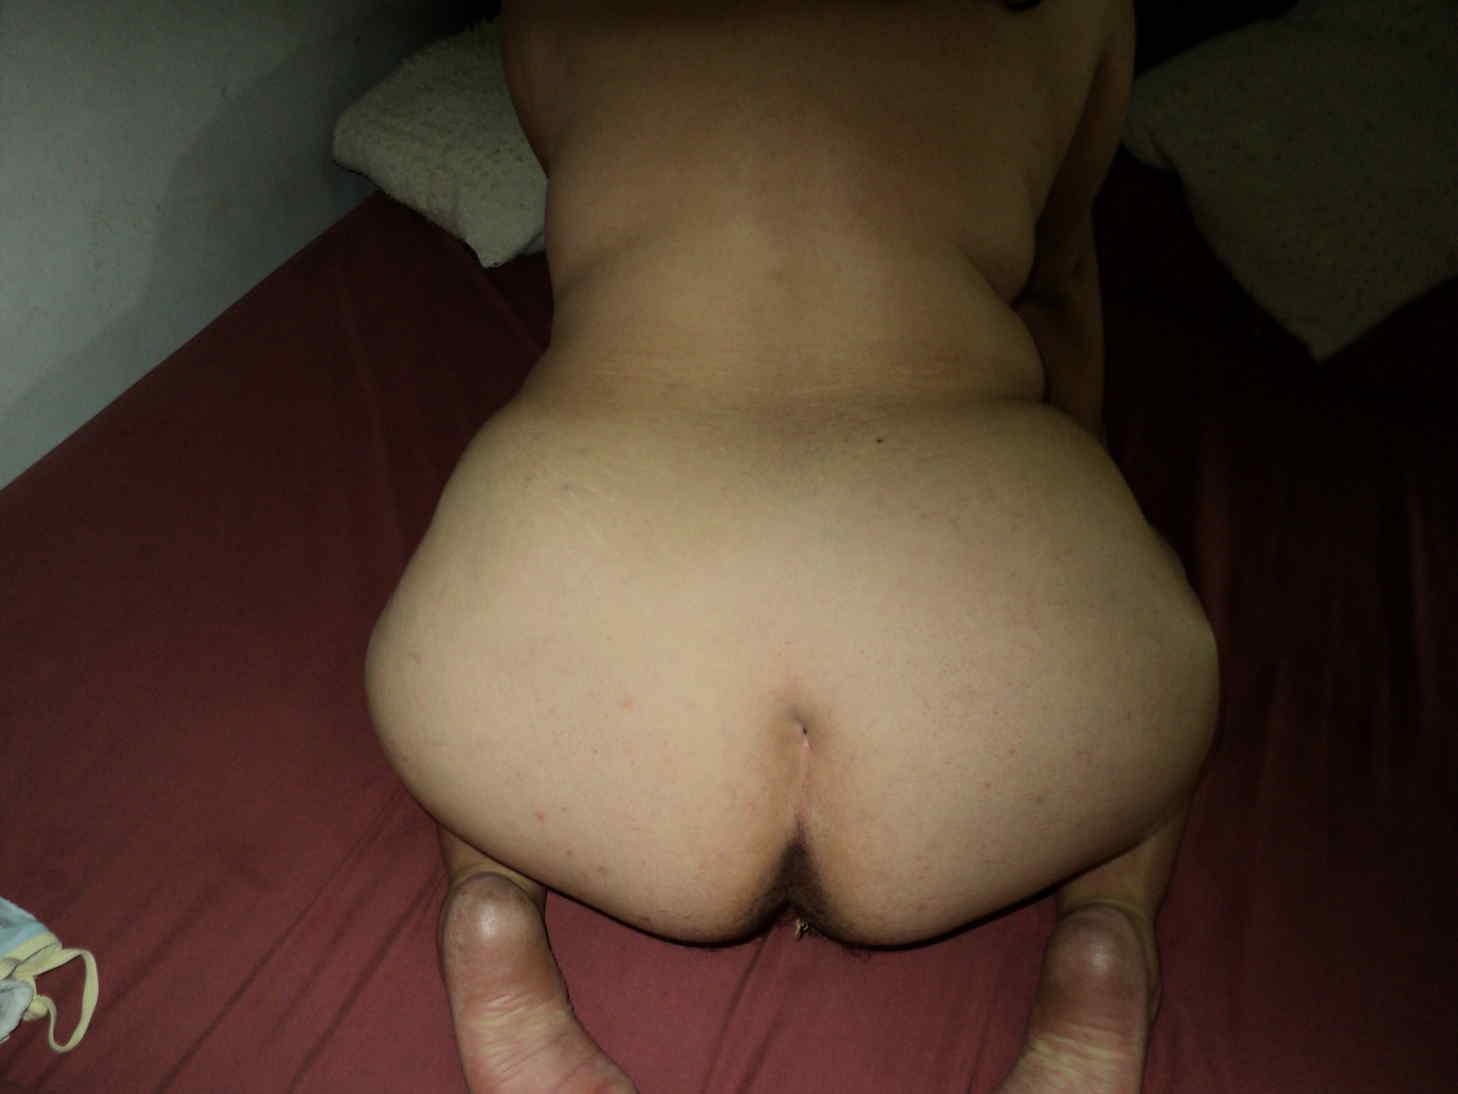 Masturbating Me squirting while